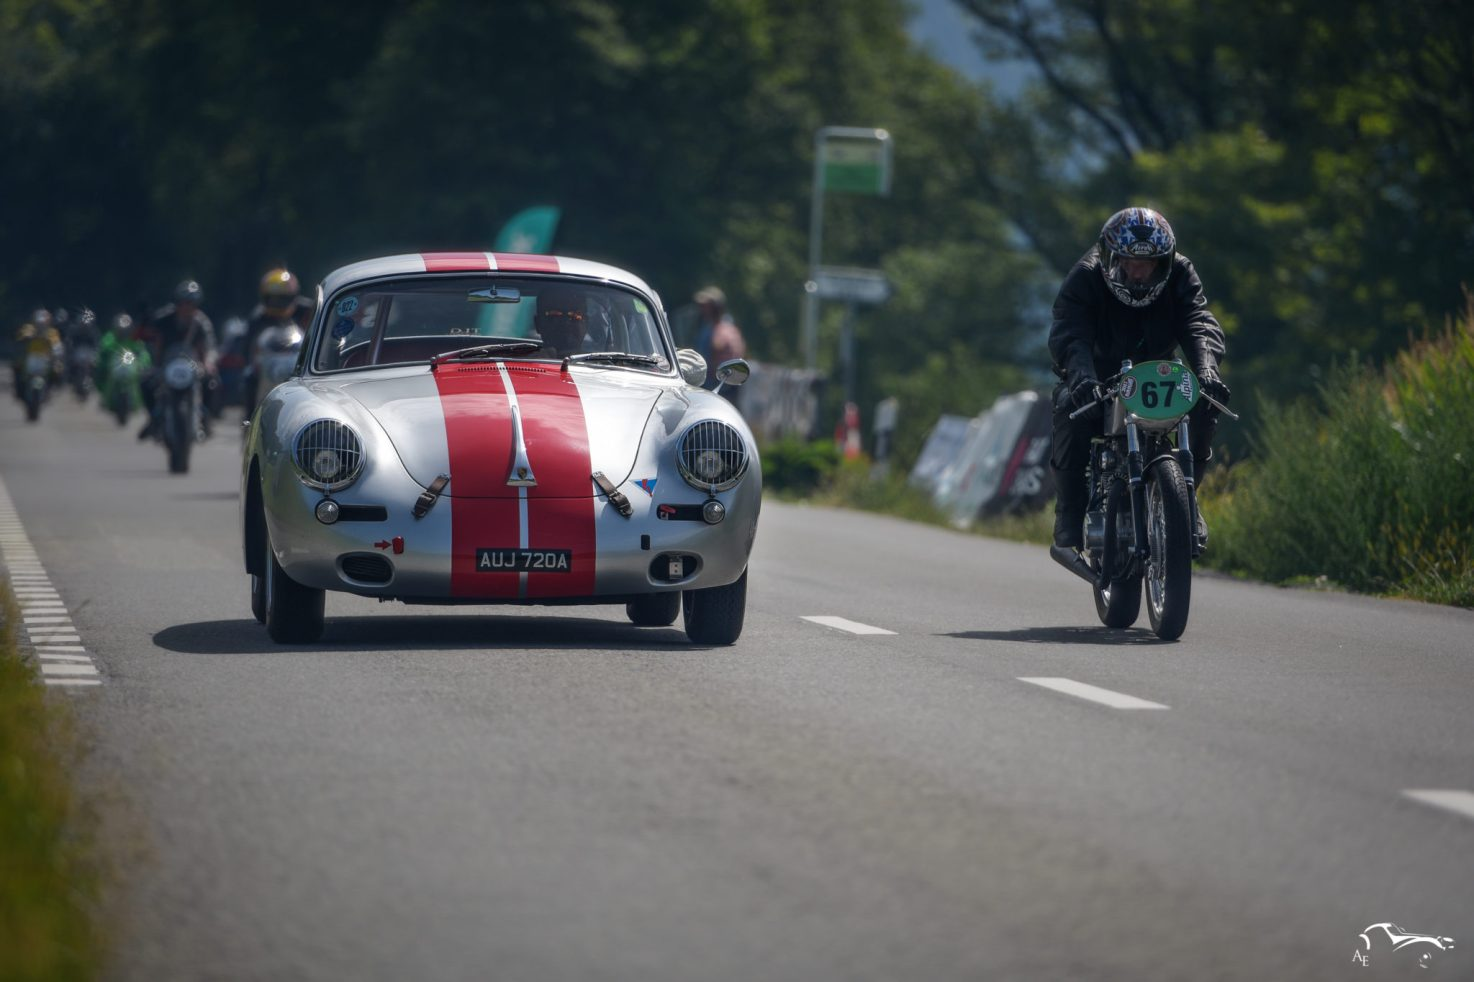 Porsche 356B 2000 cc 1963 & Honda CB350 Racing 350 cc 1970